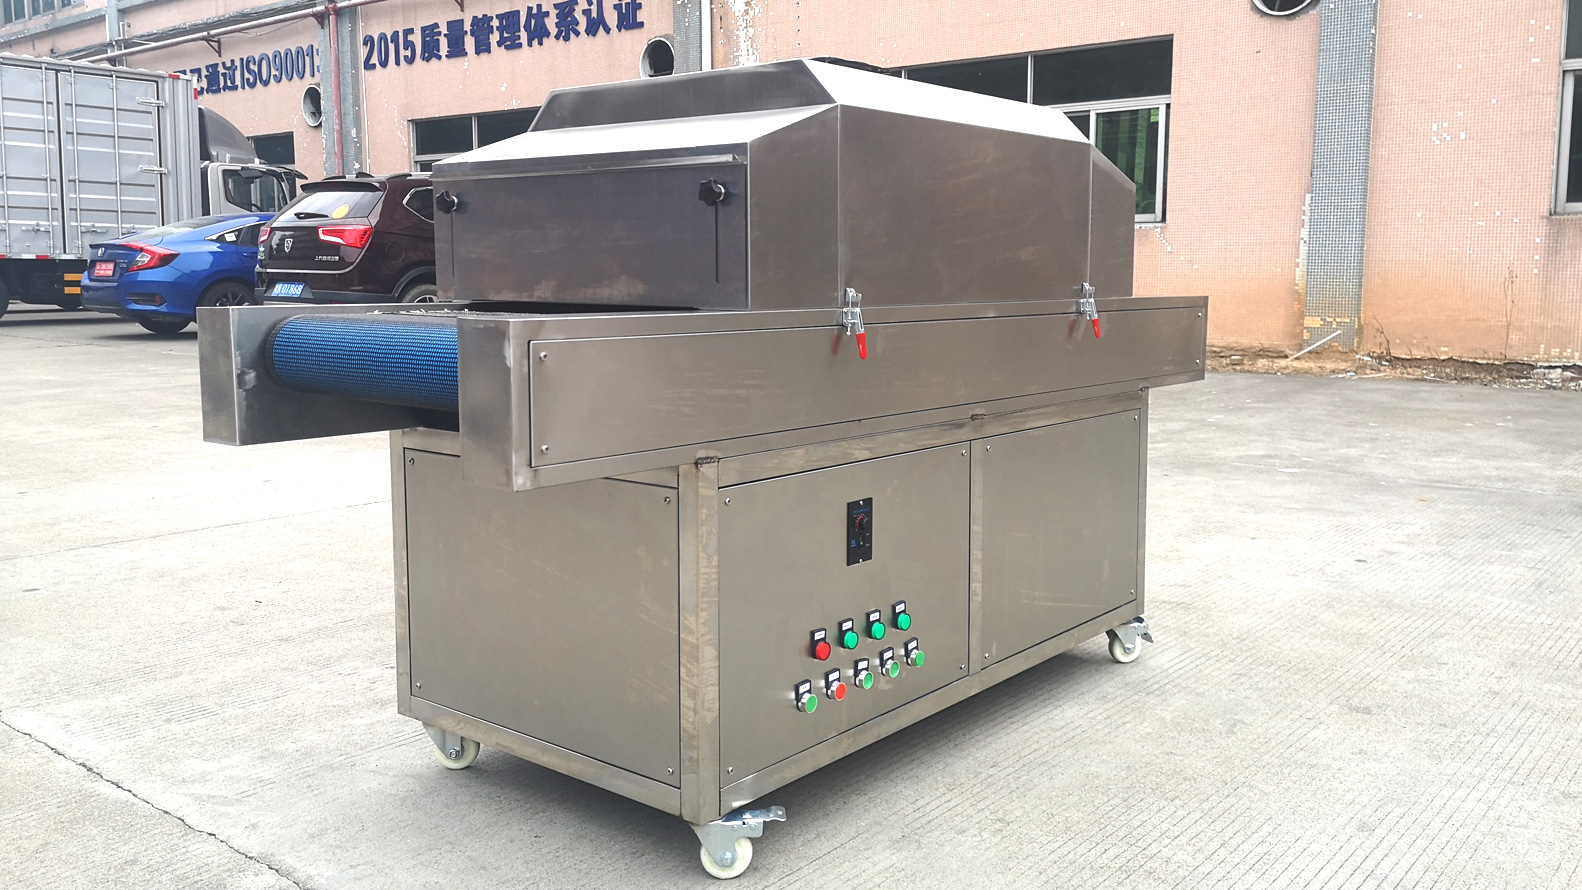 UV Sterilizer Machine for Delicatessen, Food and Beverage Processing